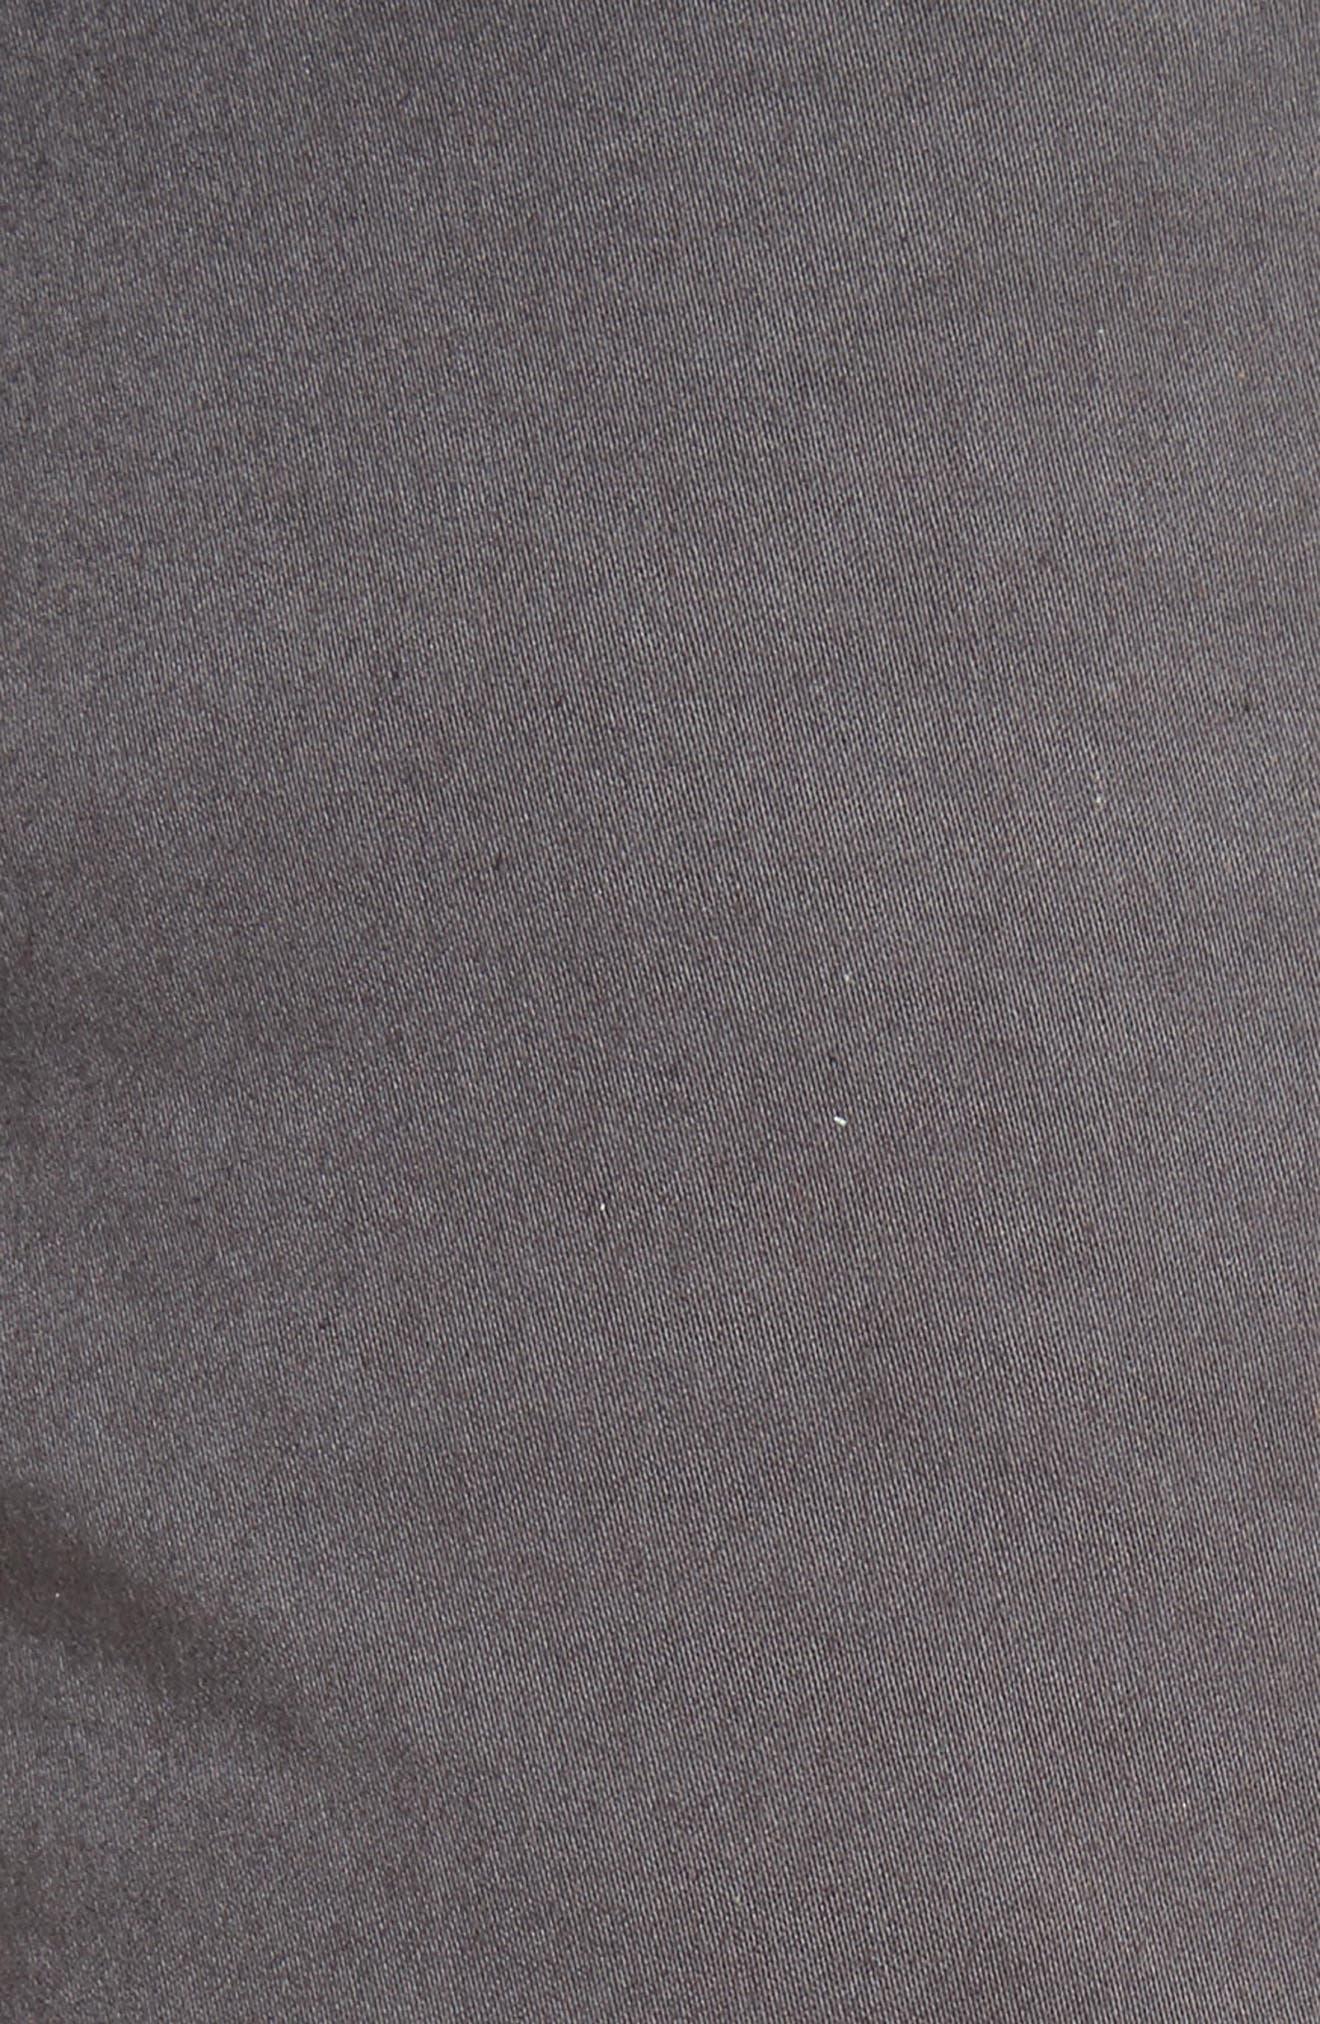 Fit 2 Slim Five-Pocket Pants,                             Alternate thumbnail 5, color,                             GREY